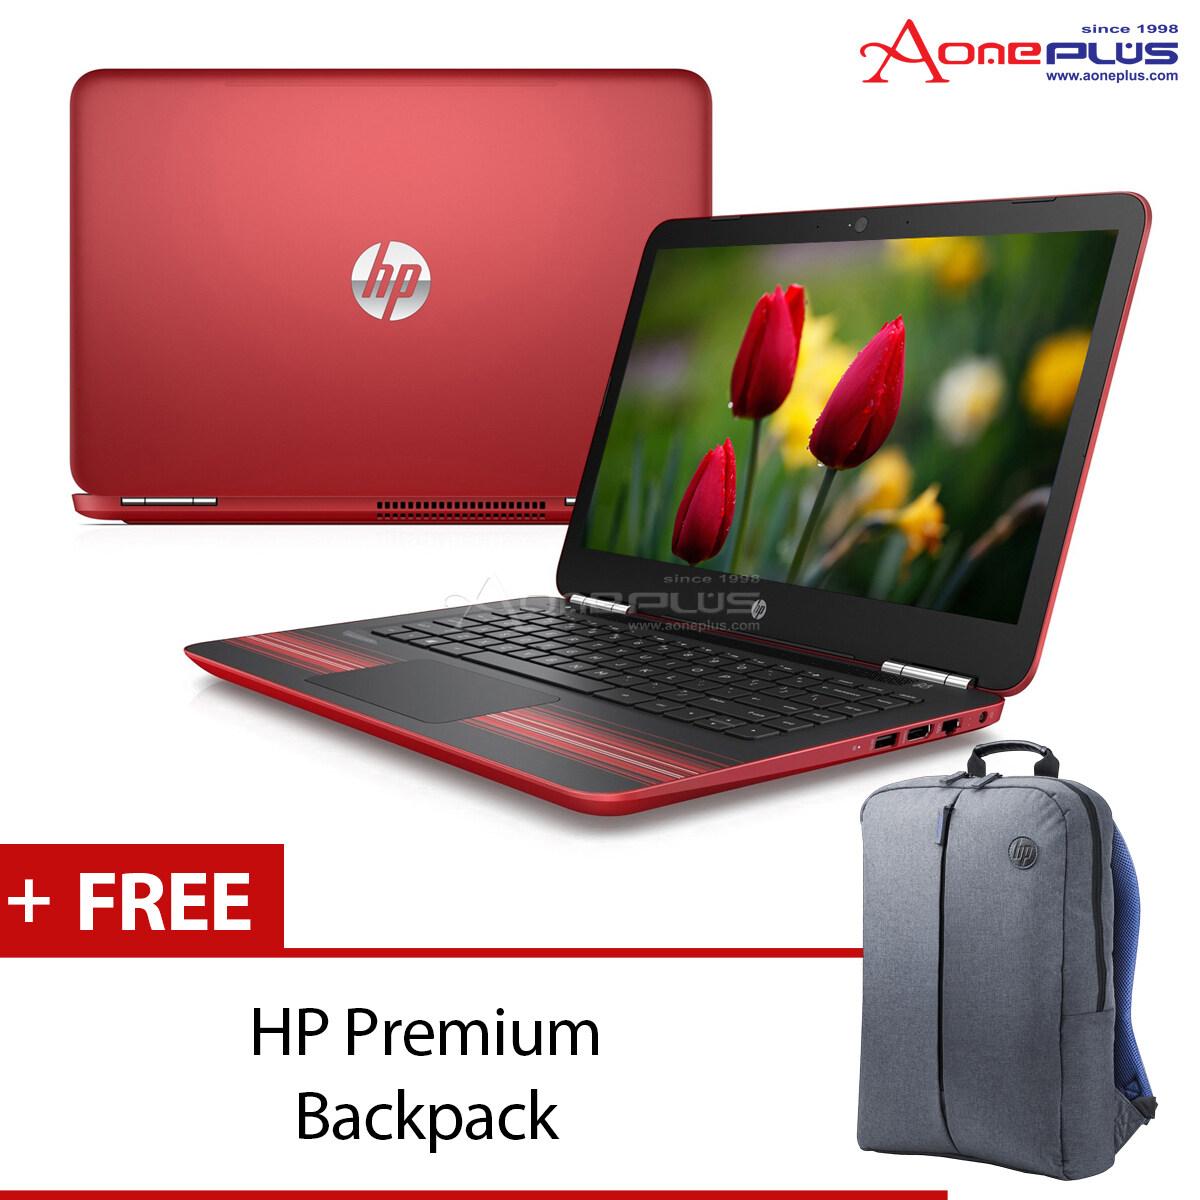 HP Pavilion 15-AU091TX (X4G12PA#UUF) Red + HP Premium Backpack Malaysia